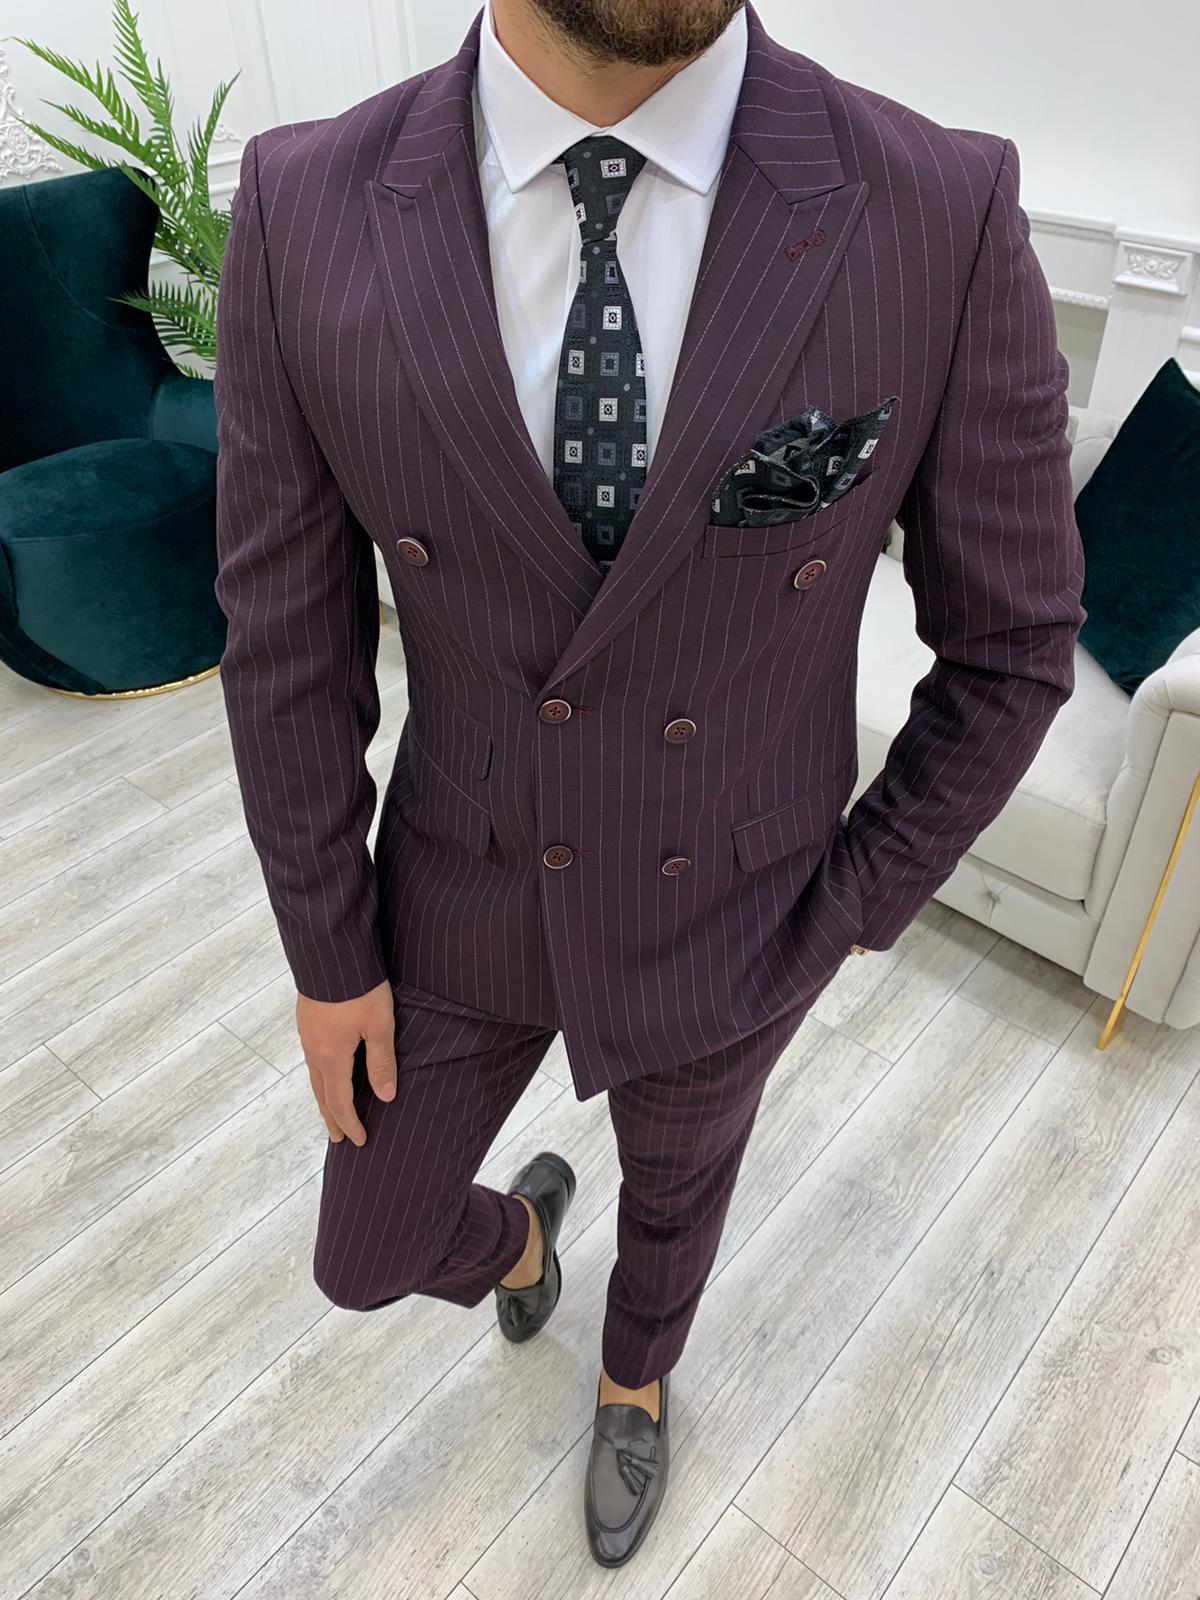 Aysoti Novak Burgundy Slim Fit Double Breasted Pinstripe Suit